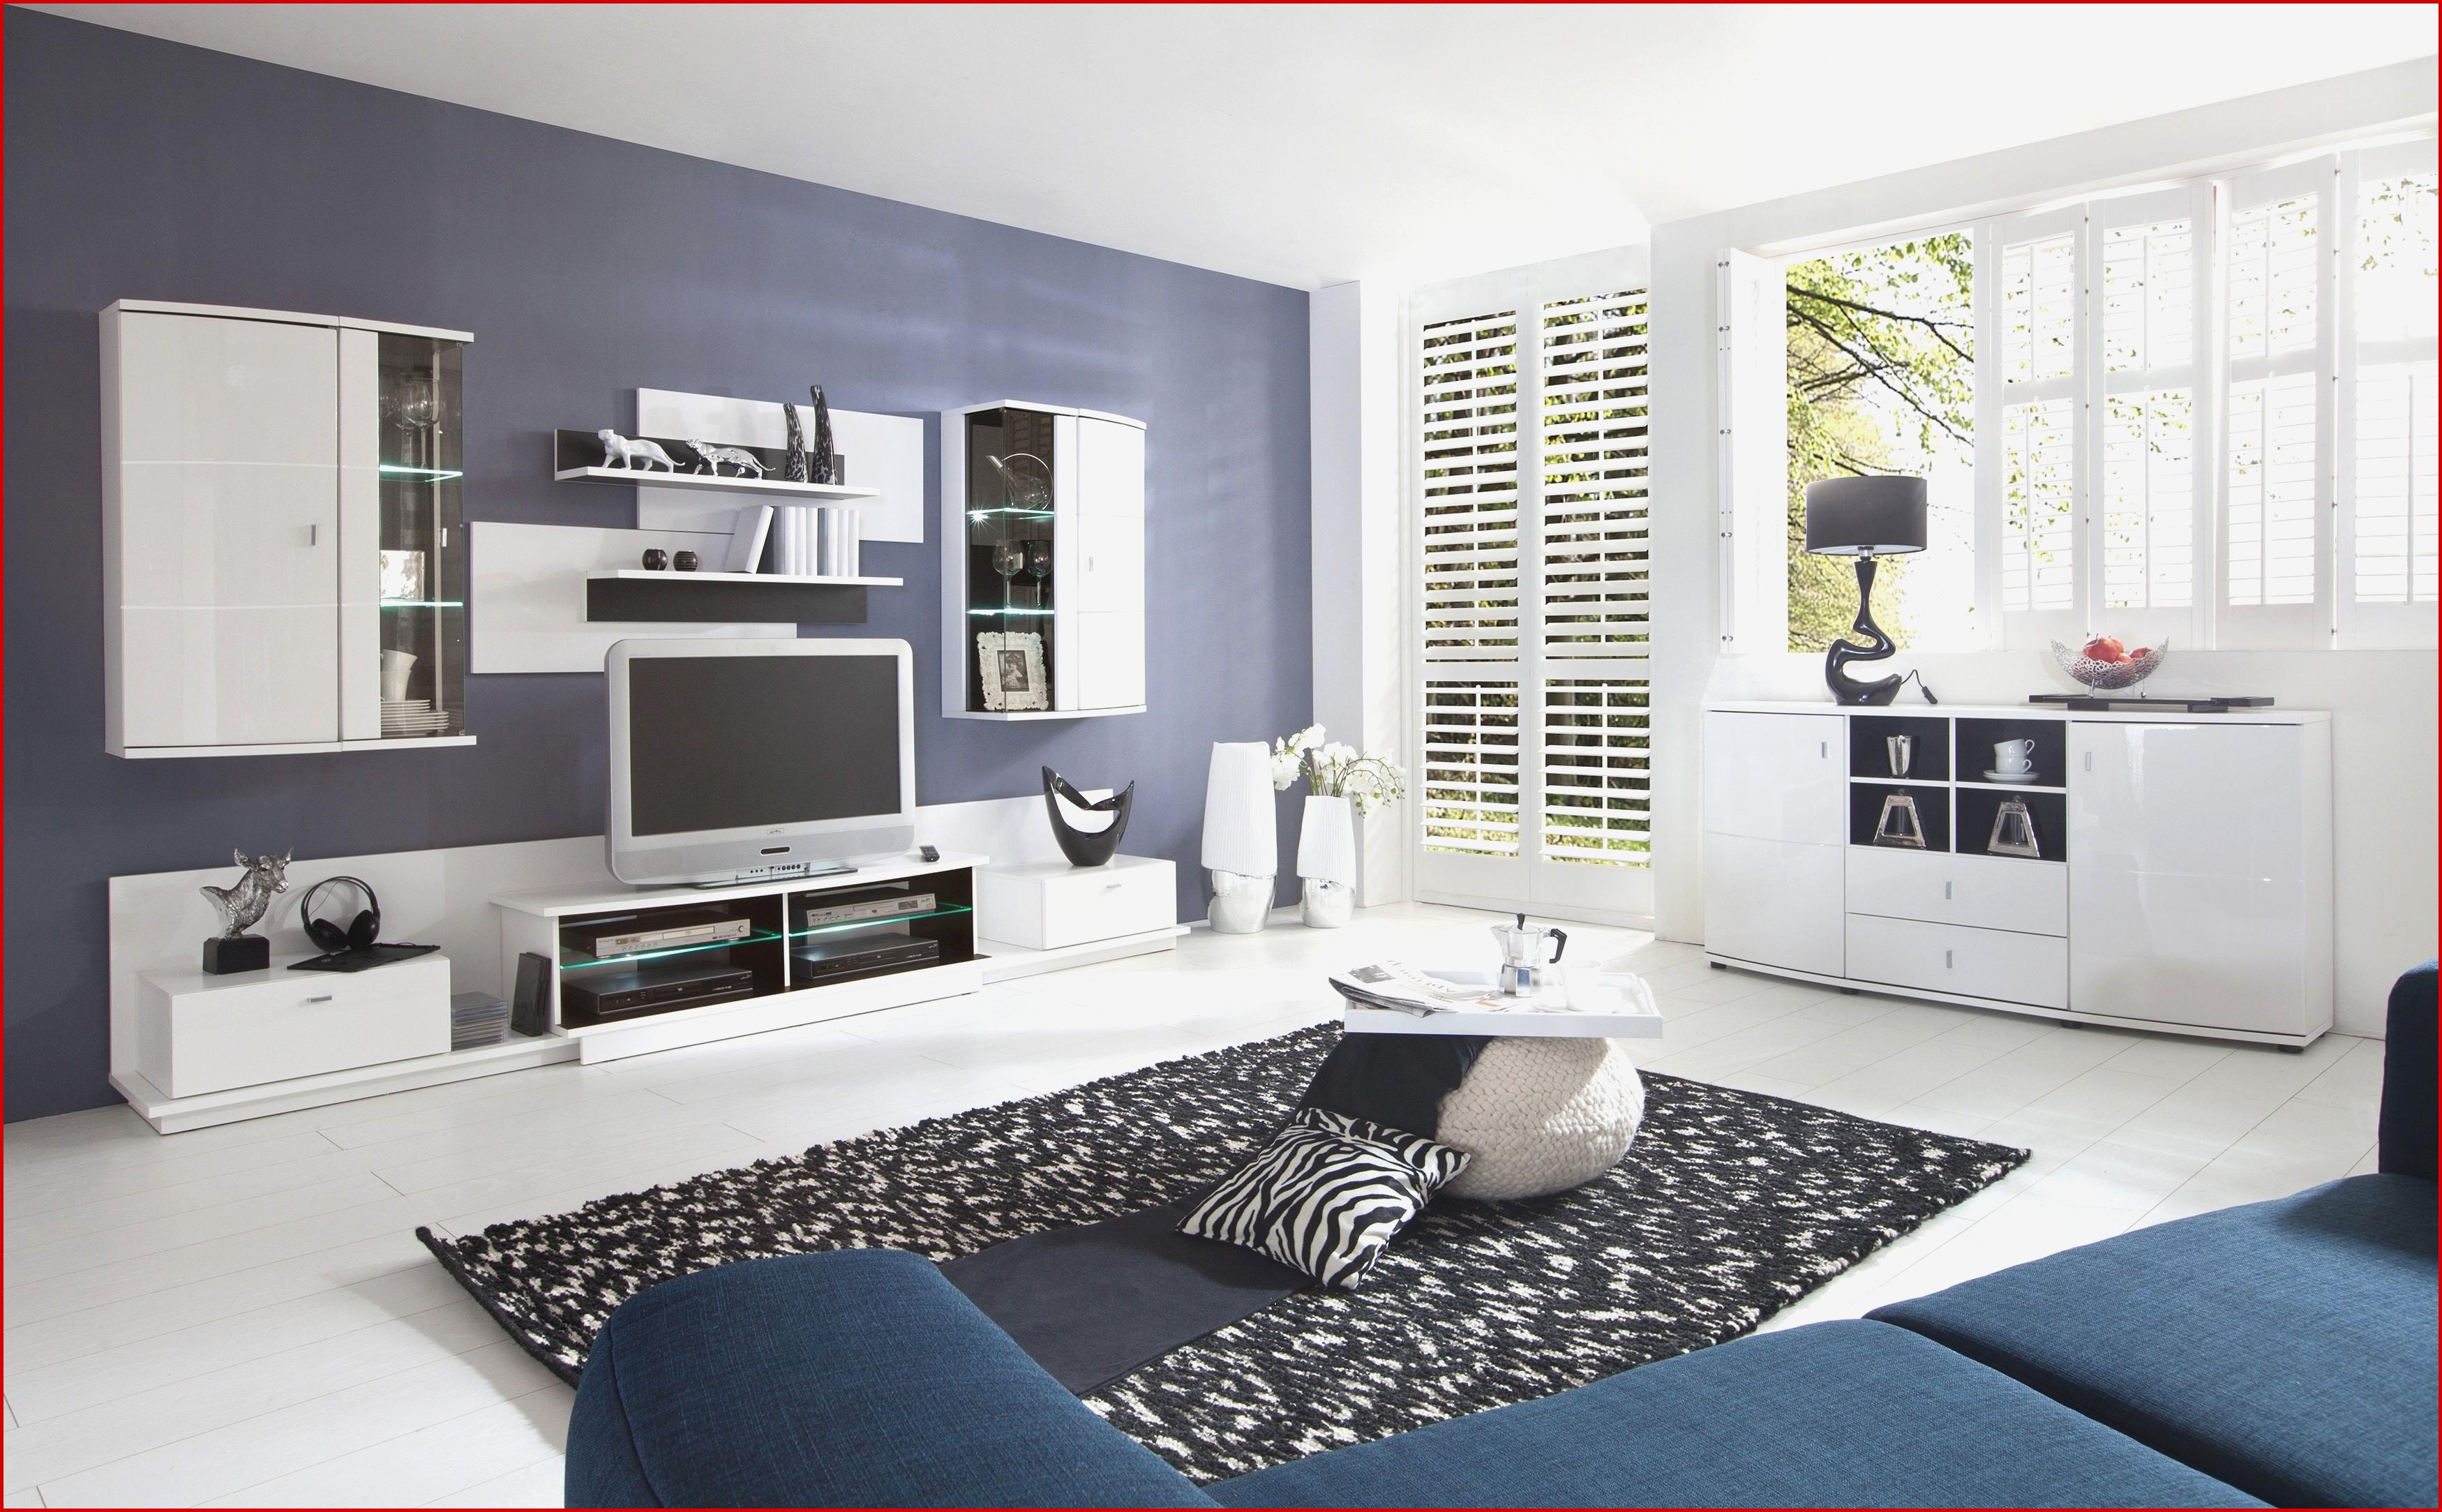 Wohnzimmer Wand Grau Interieur